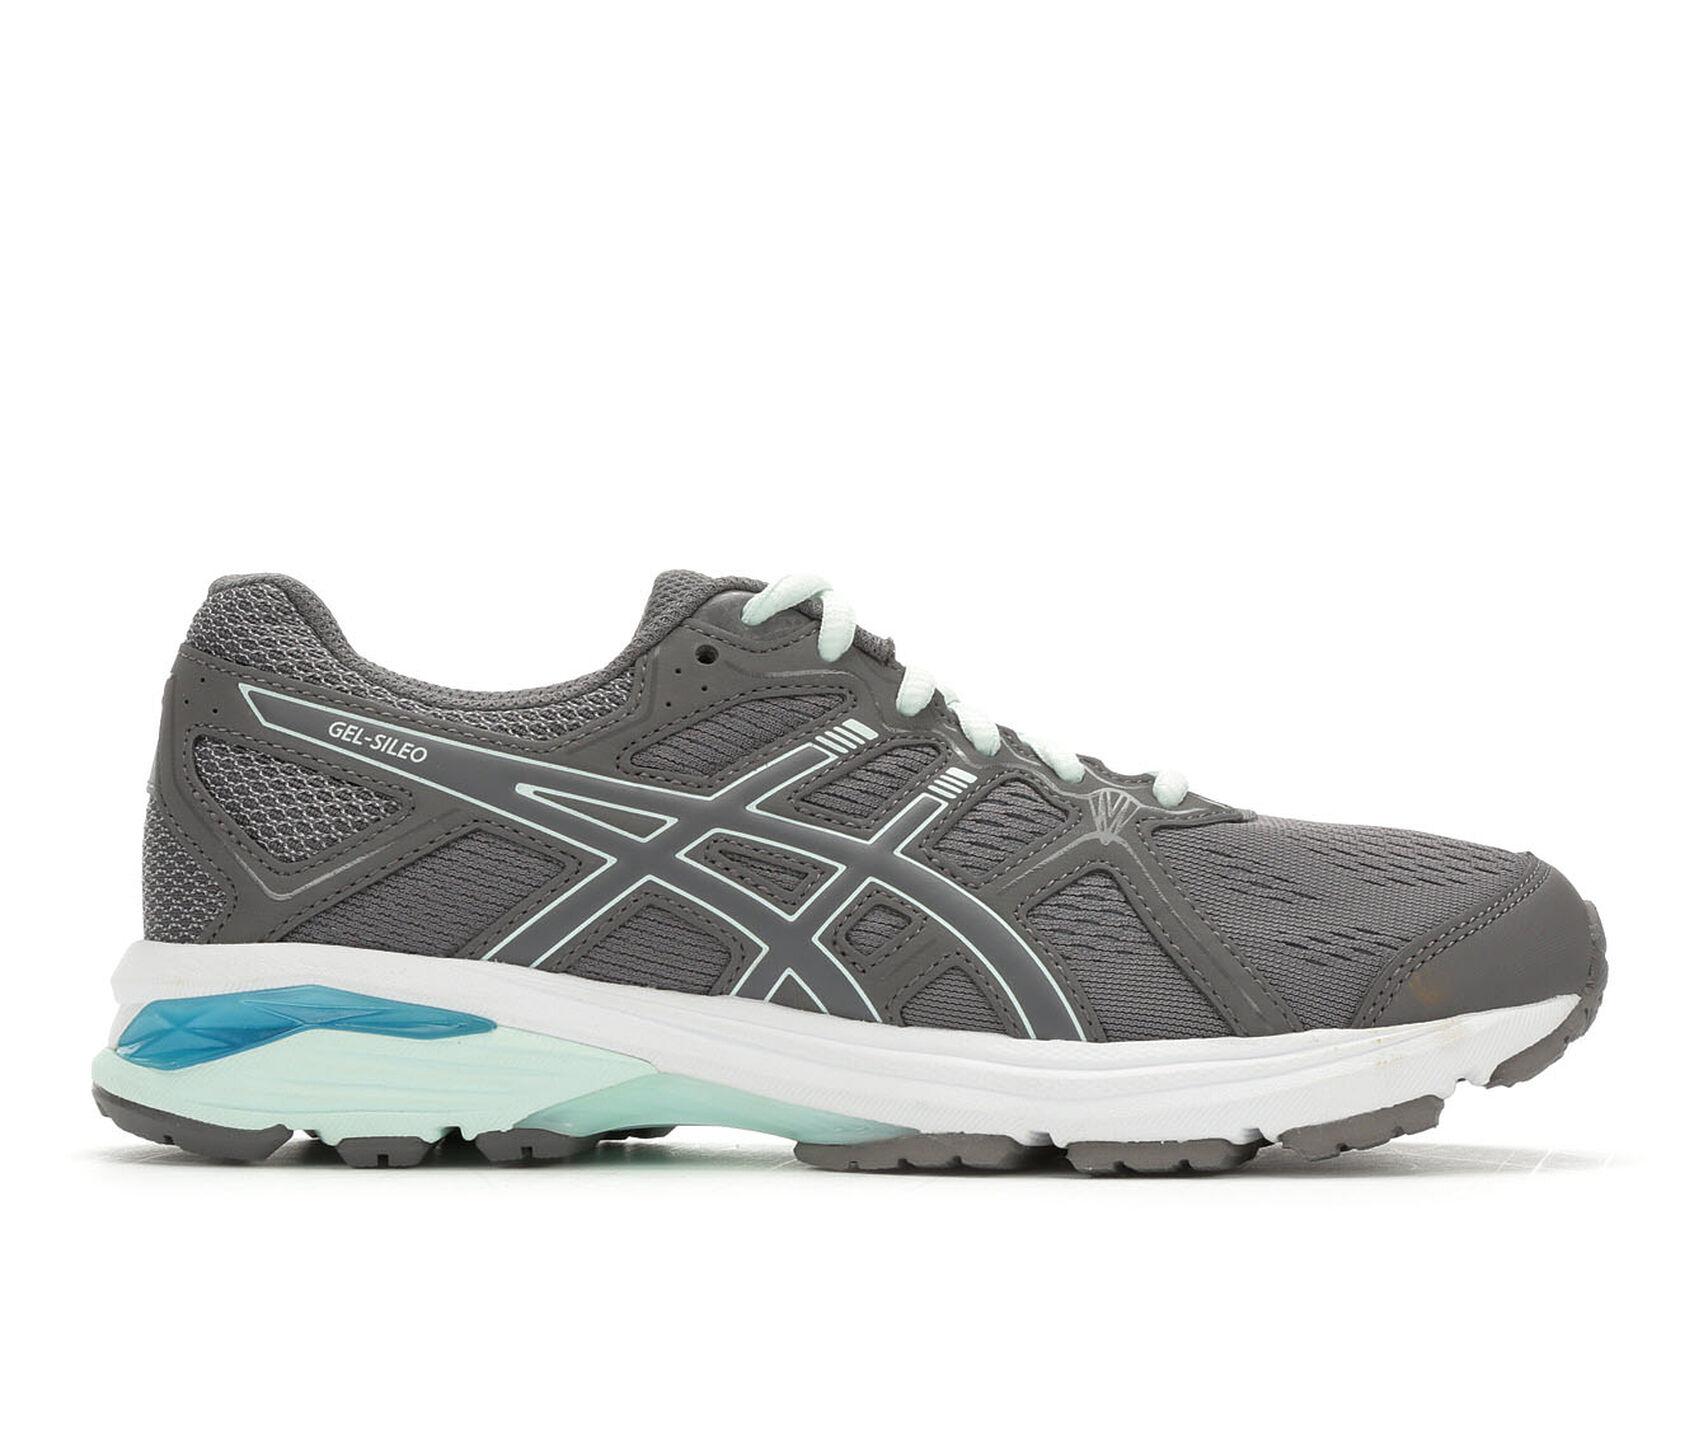 super populaire c1a4d 72194 Women's ASICS GT Xpress Running Shoes